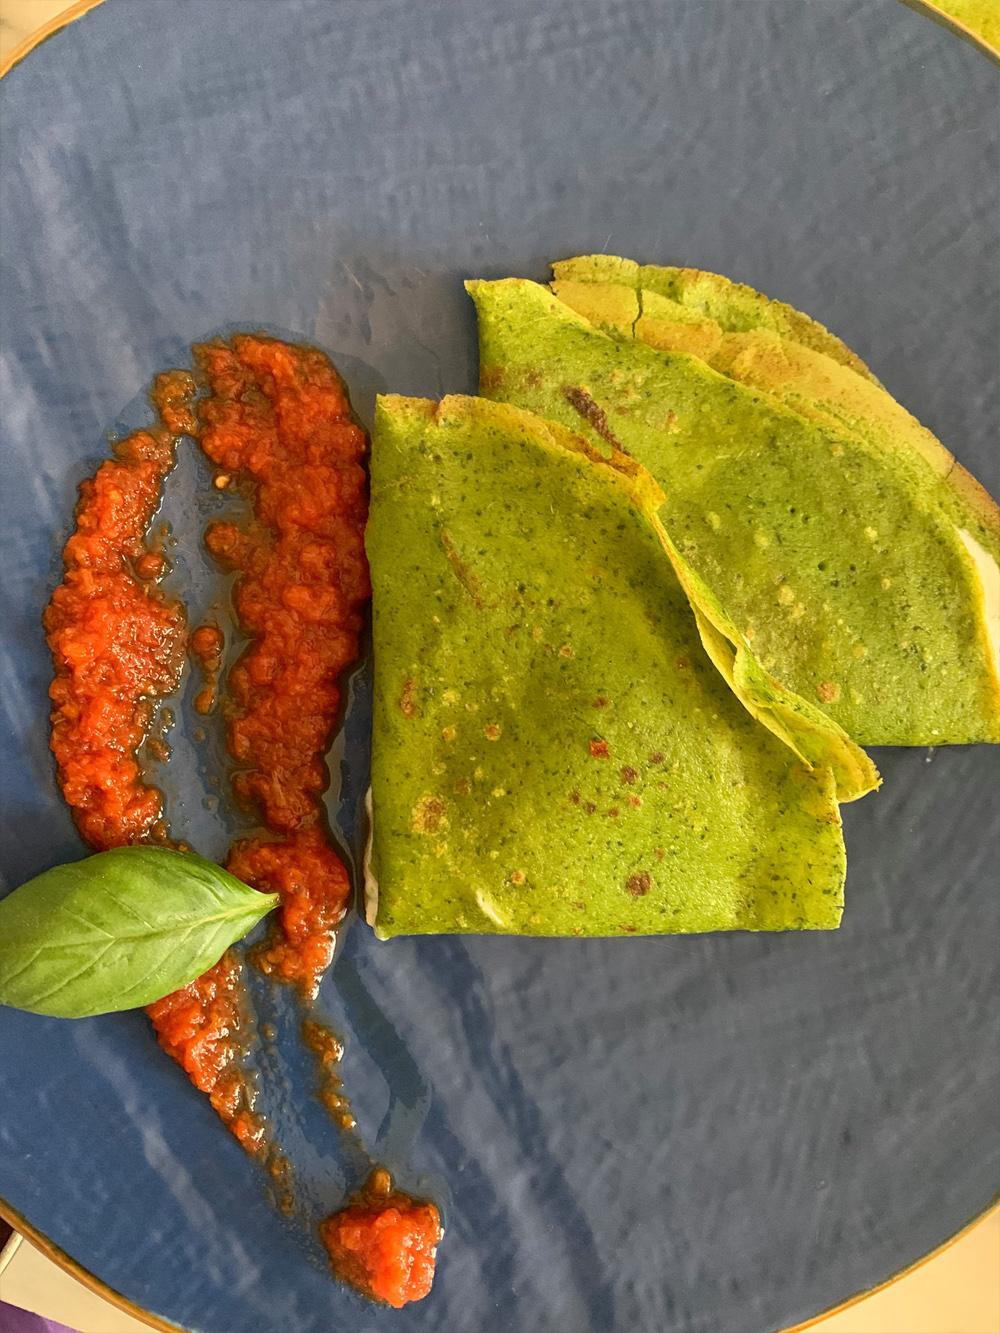 Idee in cucina per i bambini: Crêpes verdi agli spinaci